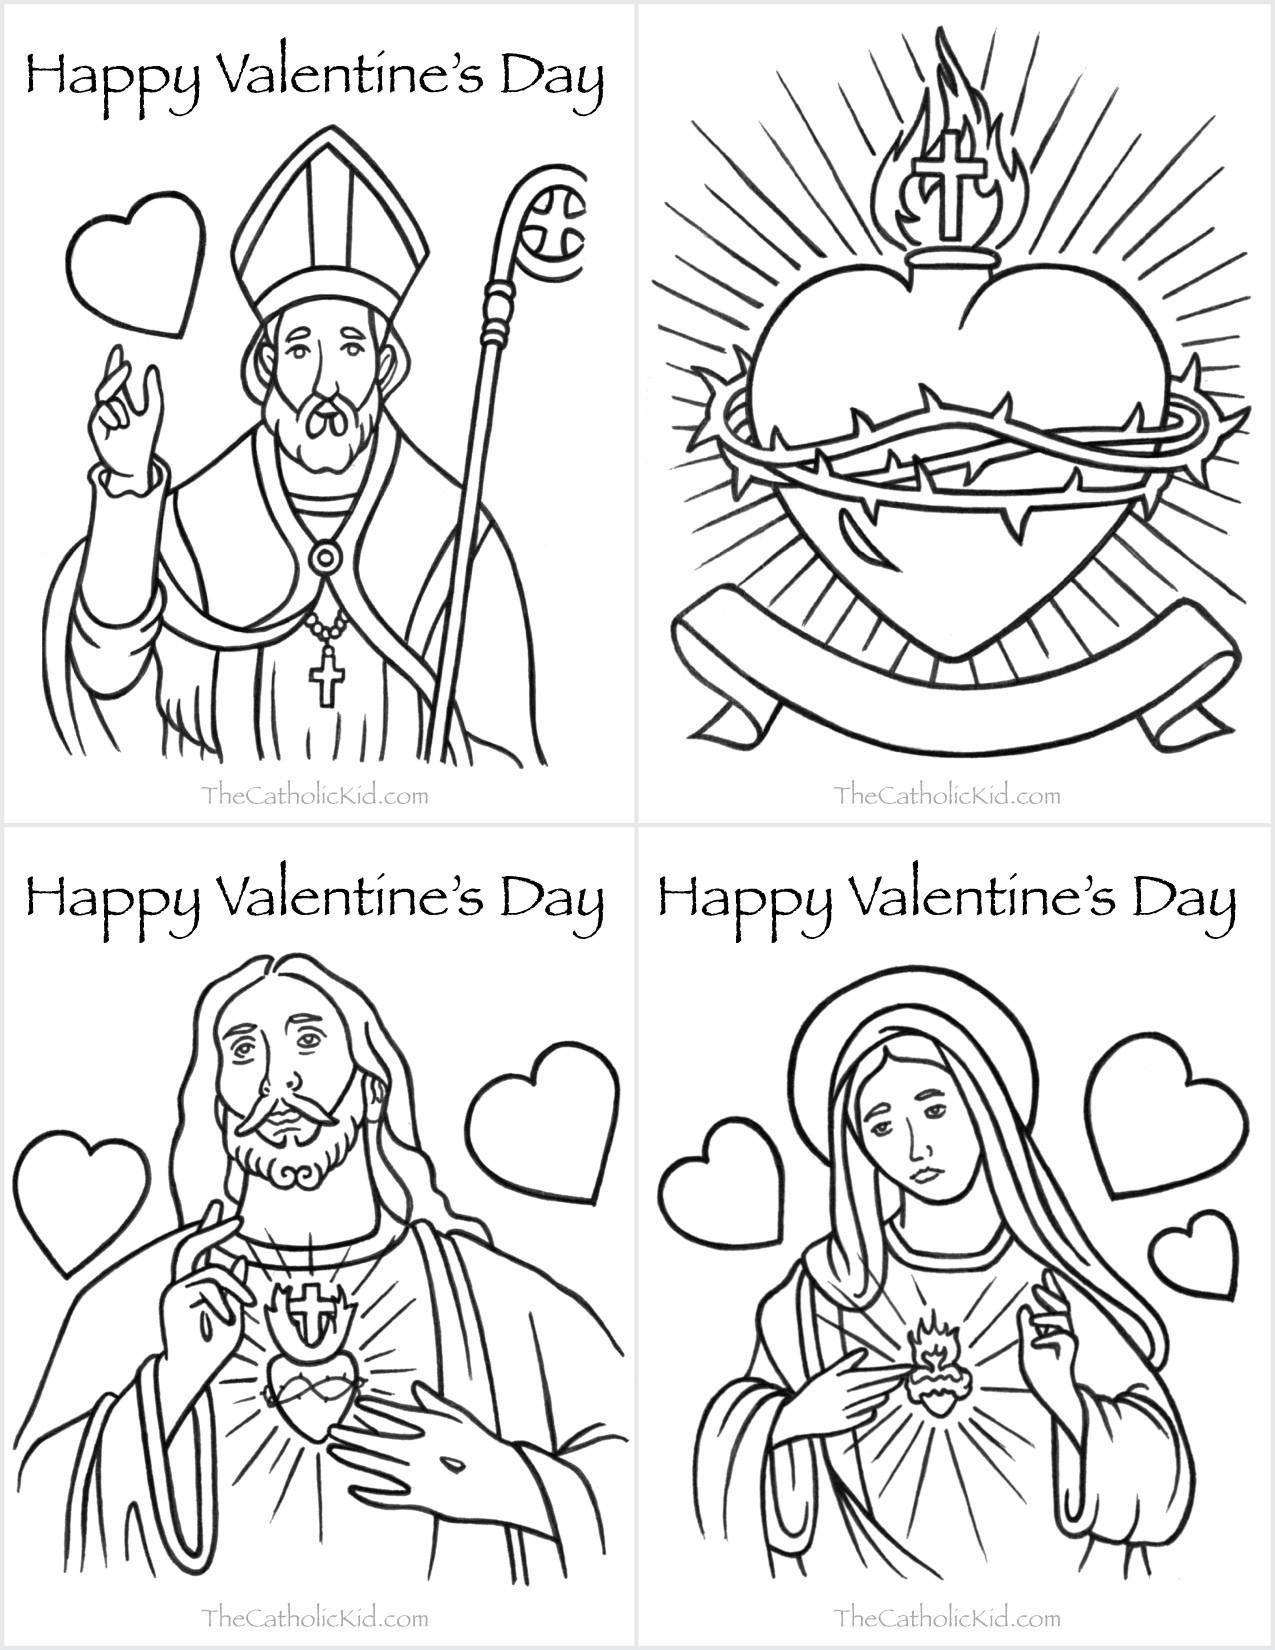 Catholic Coloring Books  Catholic Valentine s Day Cards to Color TheCatholicKid